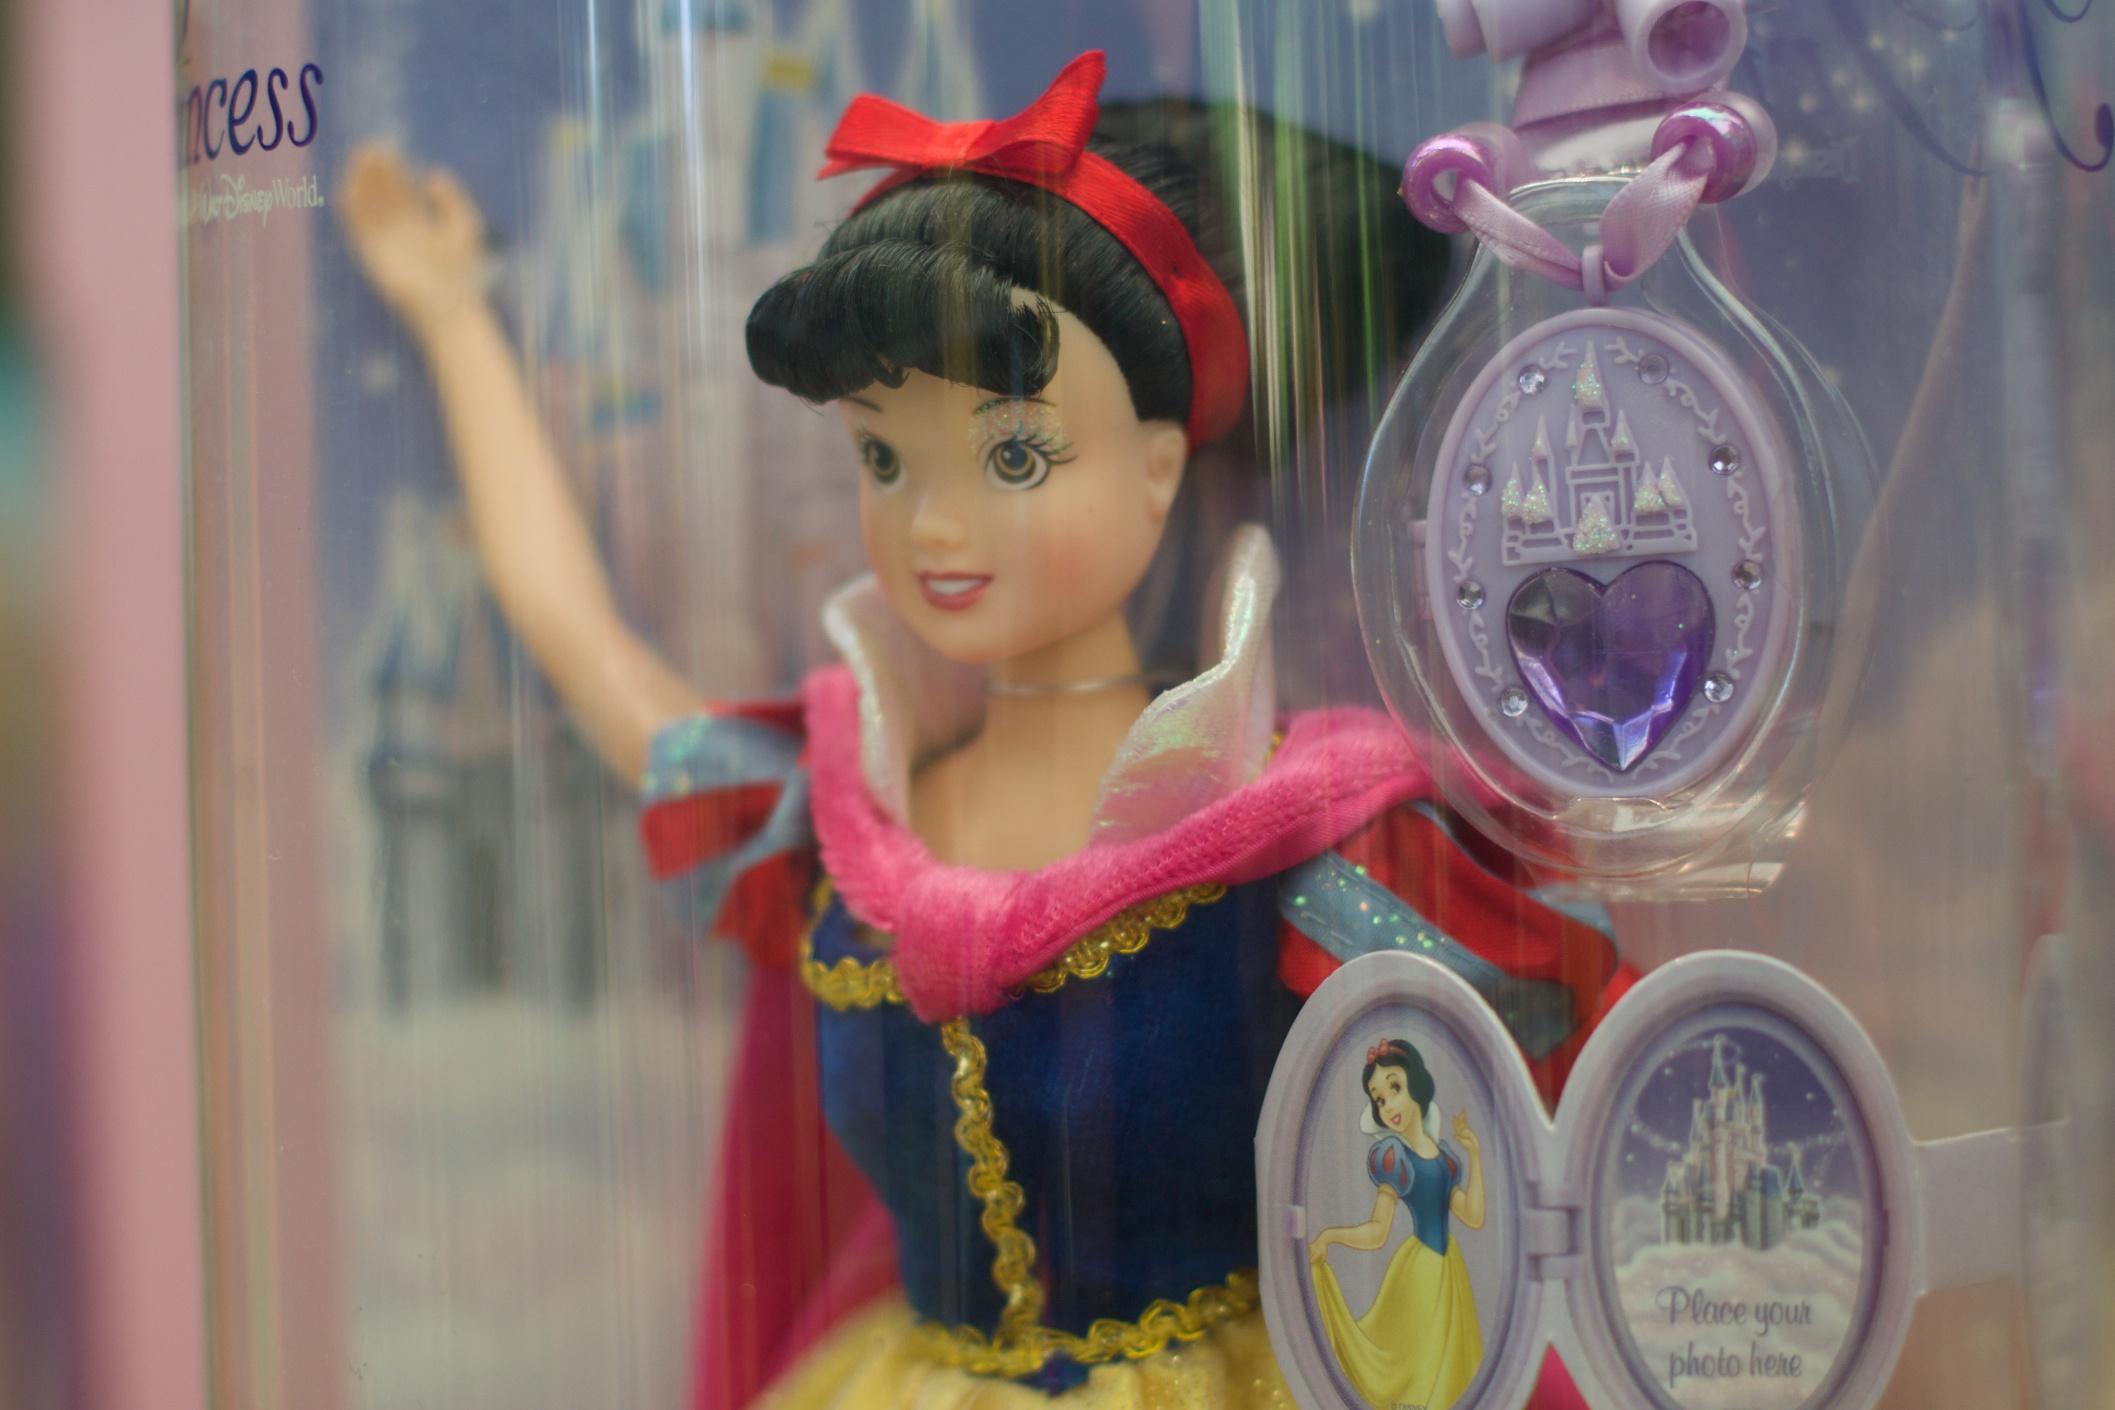 Gambar Mainan Disney Boneka Barbie 2115x1410 439989 Barby